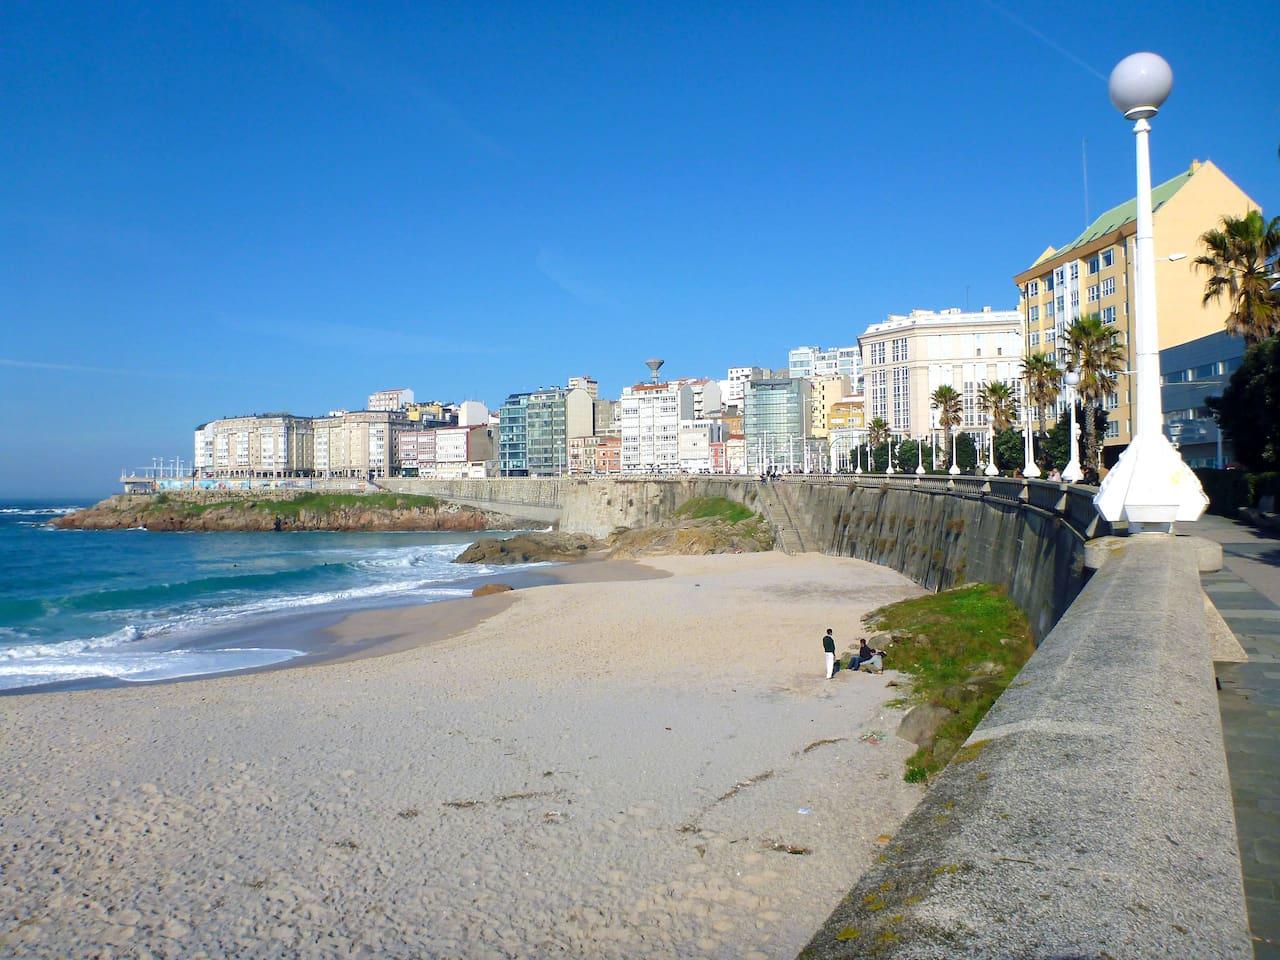 Playa de Riazor a 3min de la casa / Riazor beach 3min away